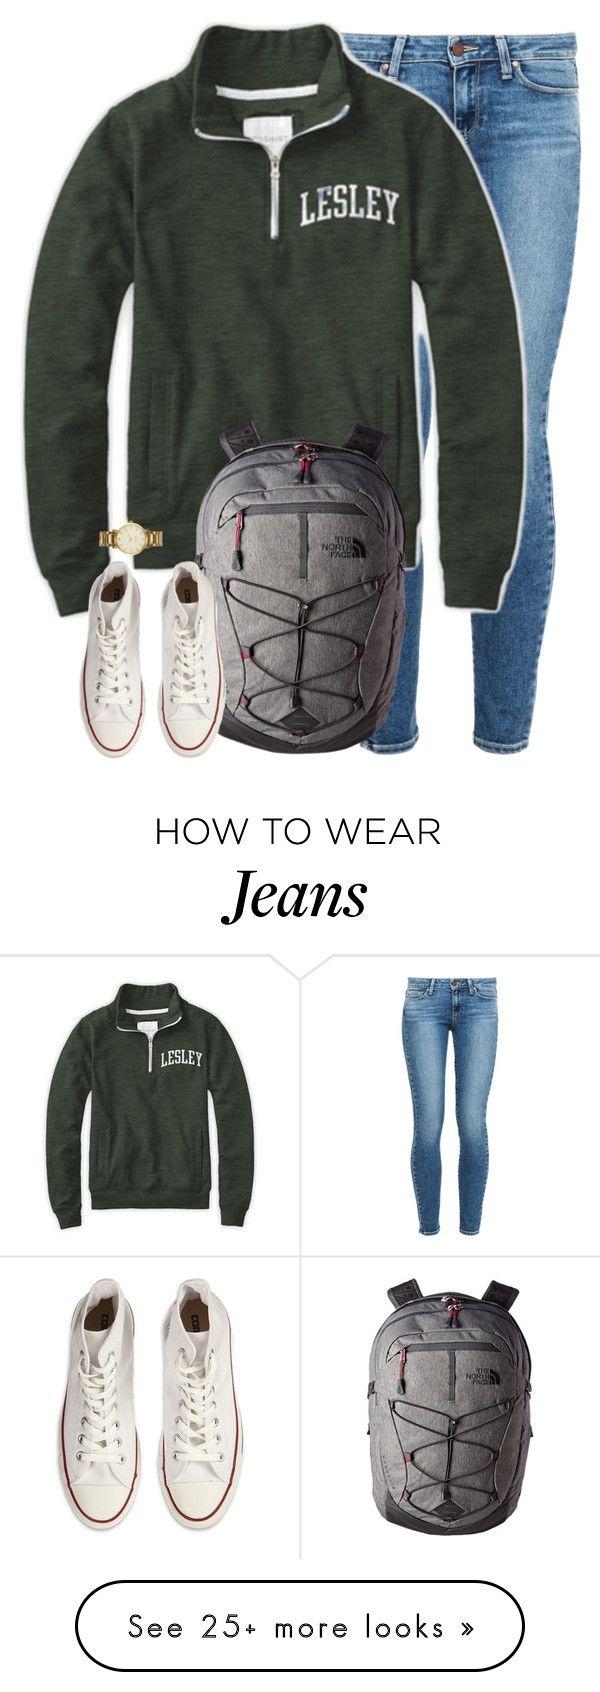 Best Style For Teen Girls